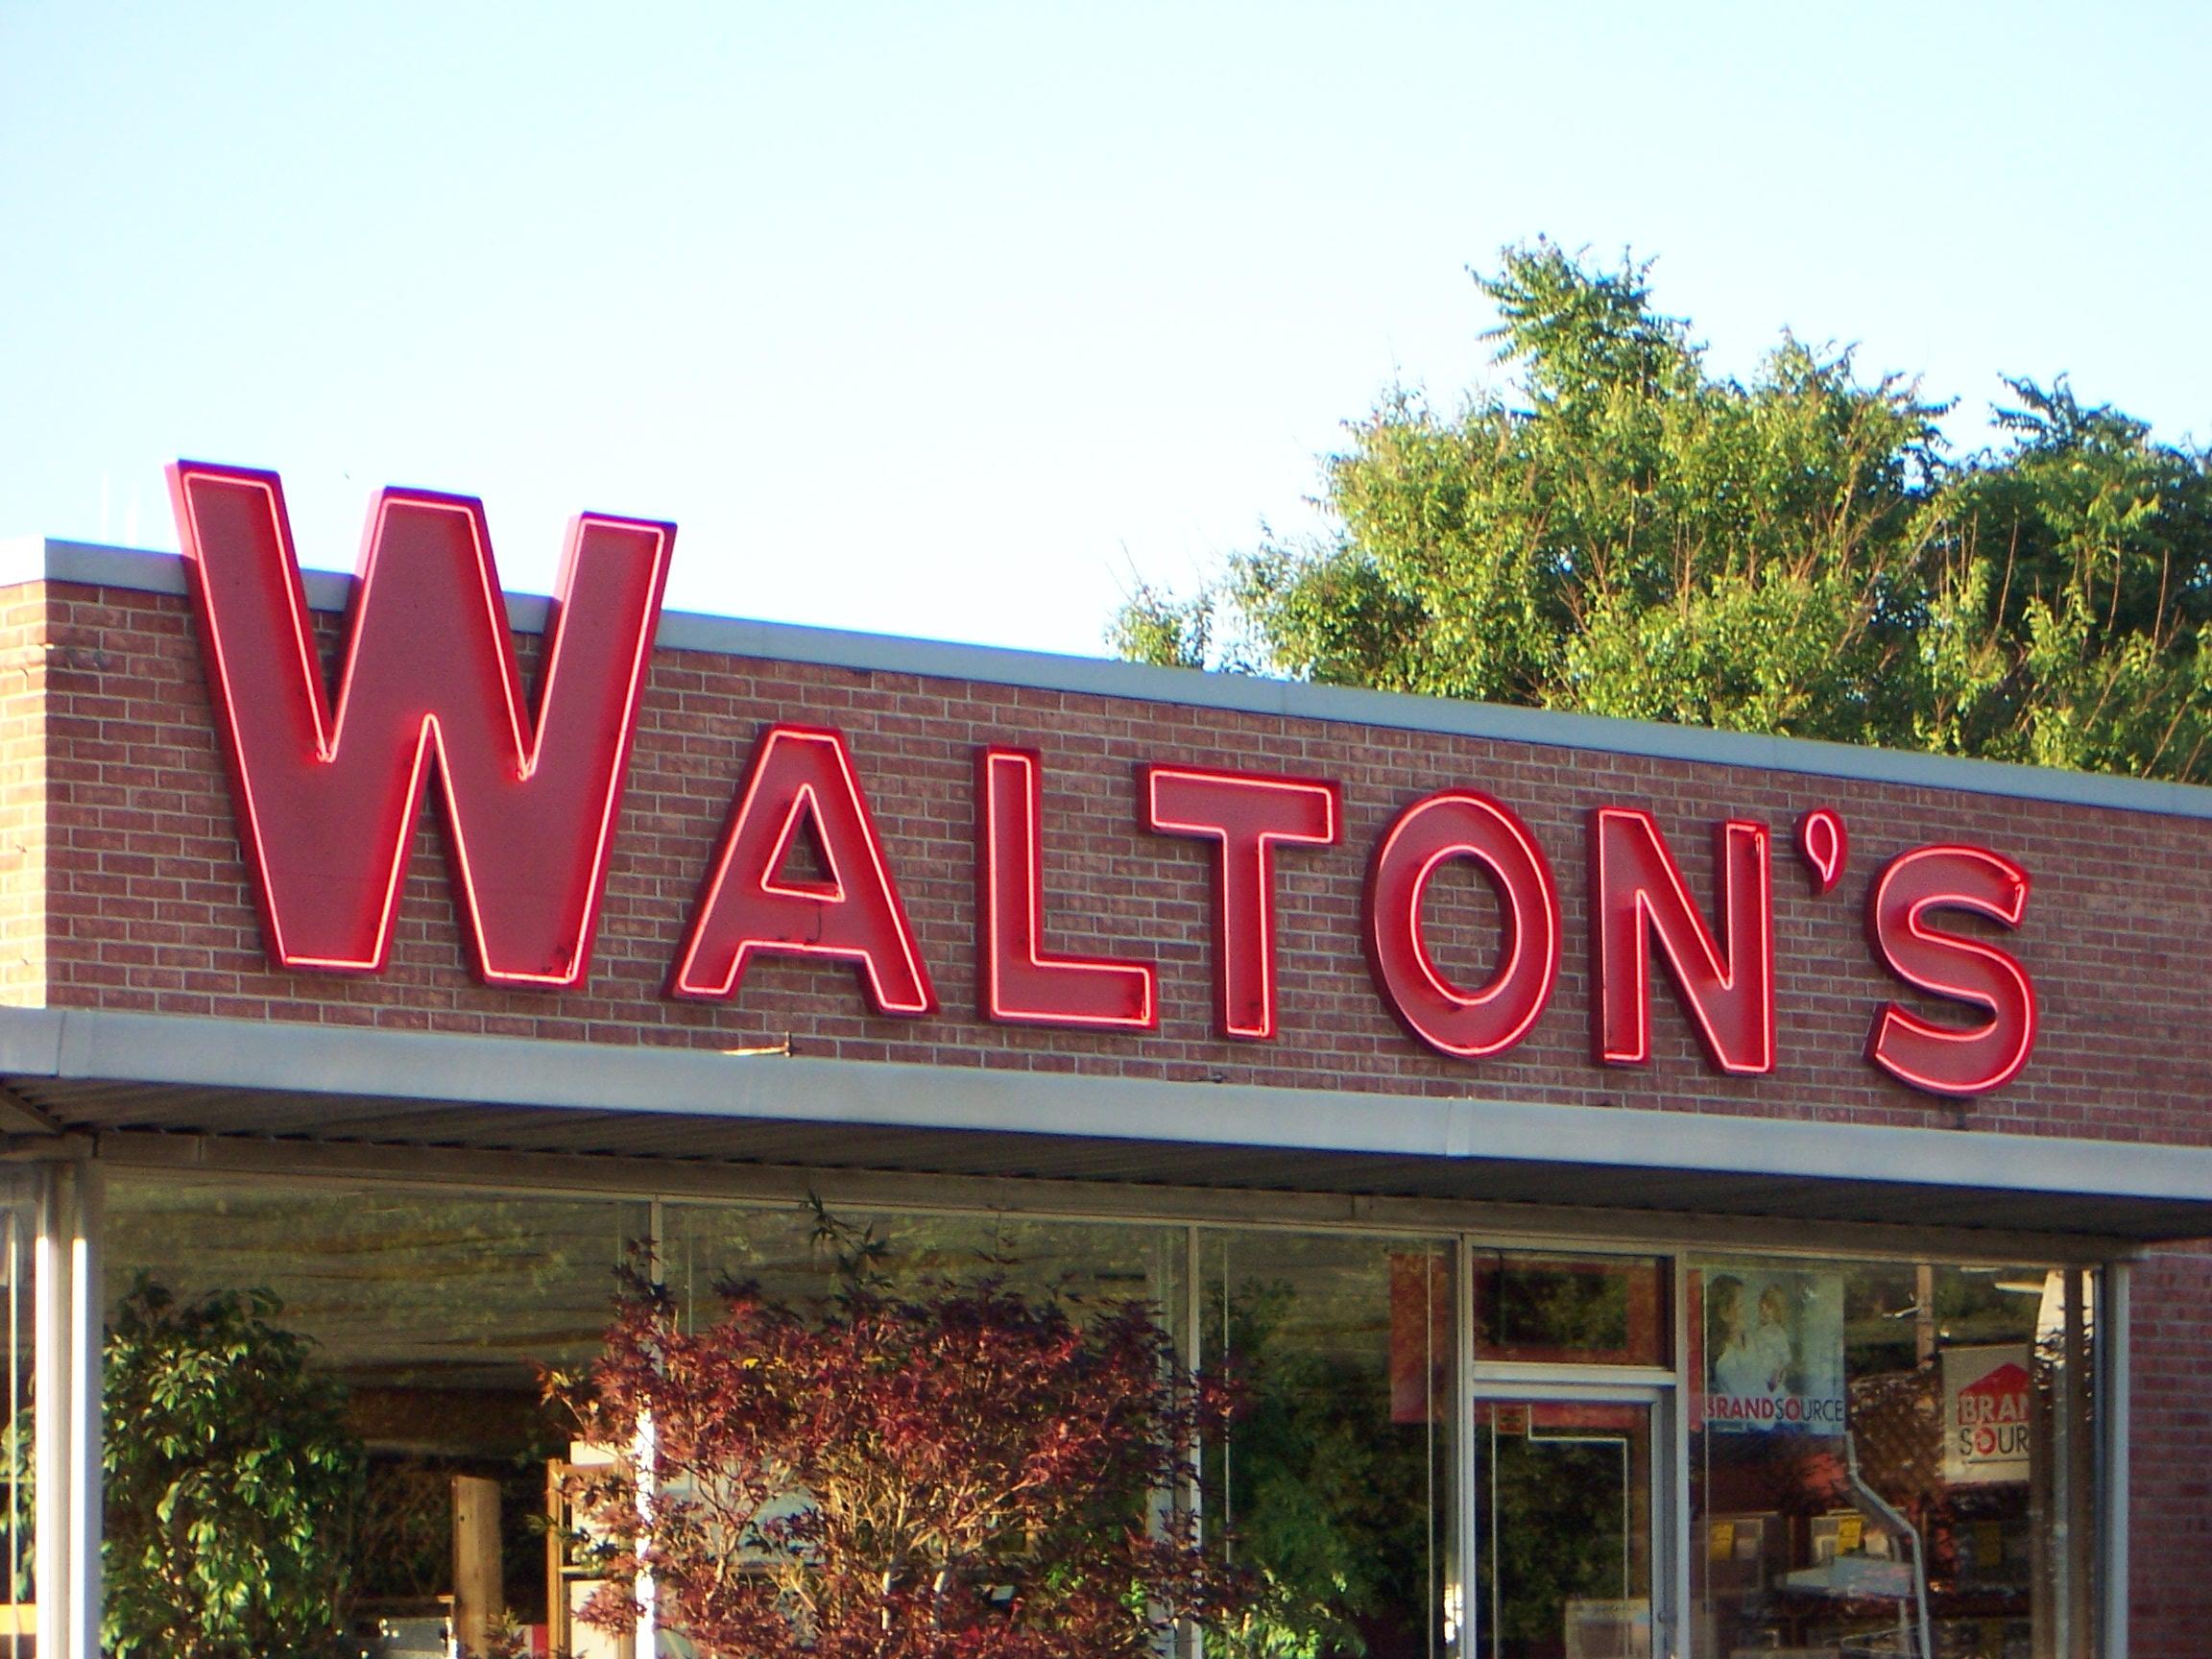 Walton's Appliance and Electronics - 300 West College Avenue, Jacksonville, Illinois U.S.A. - June 8, 2007